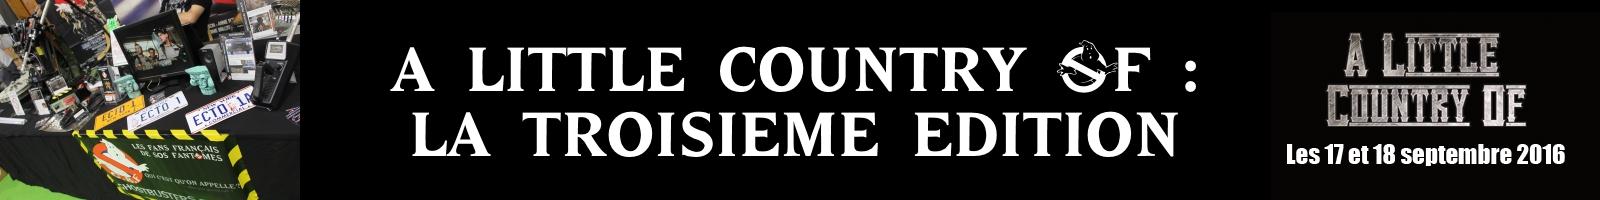 http://www.ghostbusters-france.net/a-little-country-of-la-troisieme-edition/